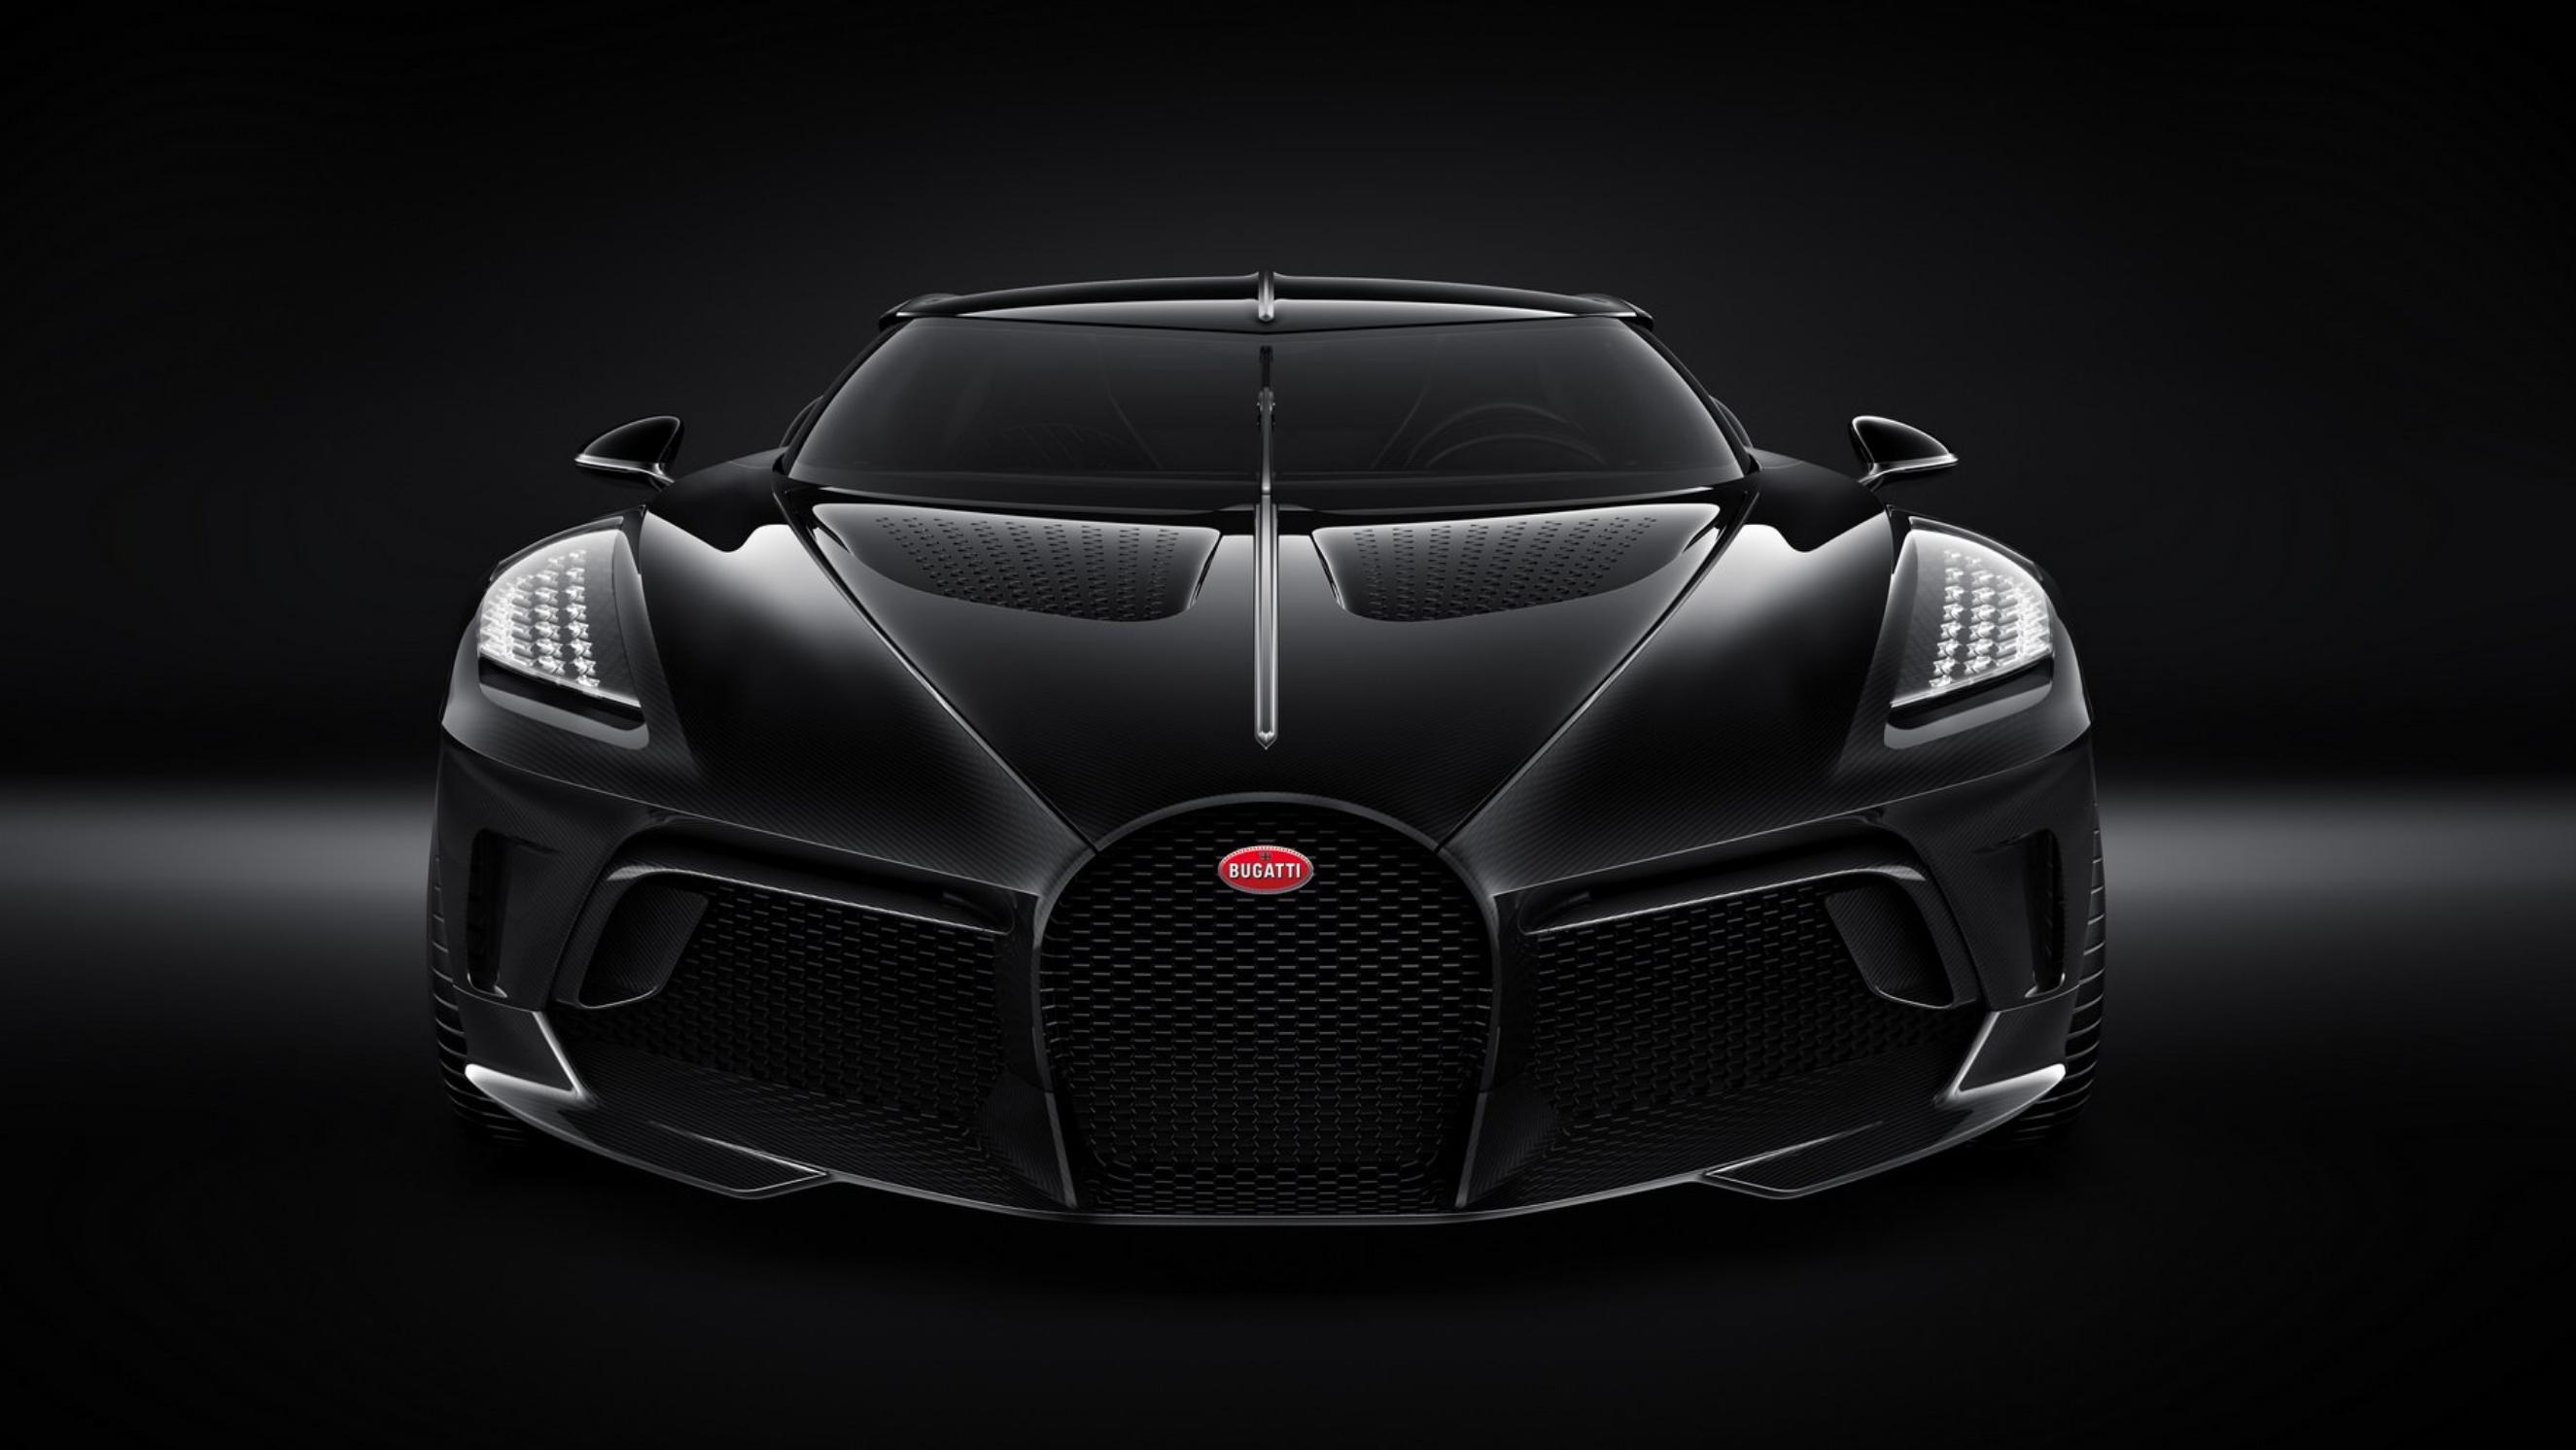 16,5 Milyon Euro'luk Otomobil! Bugatti La Voiture Noire